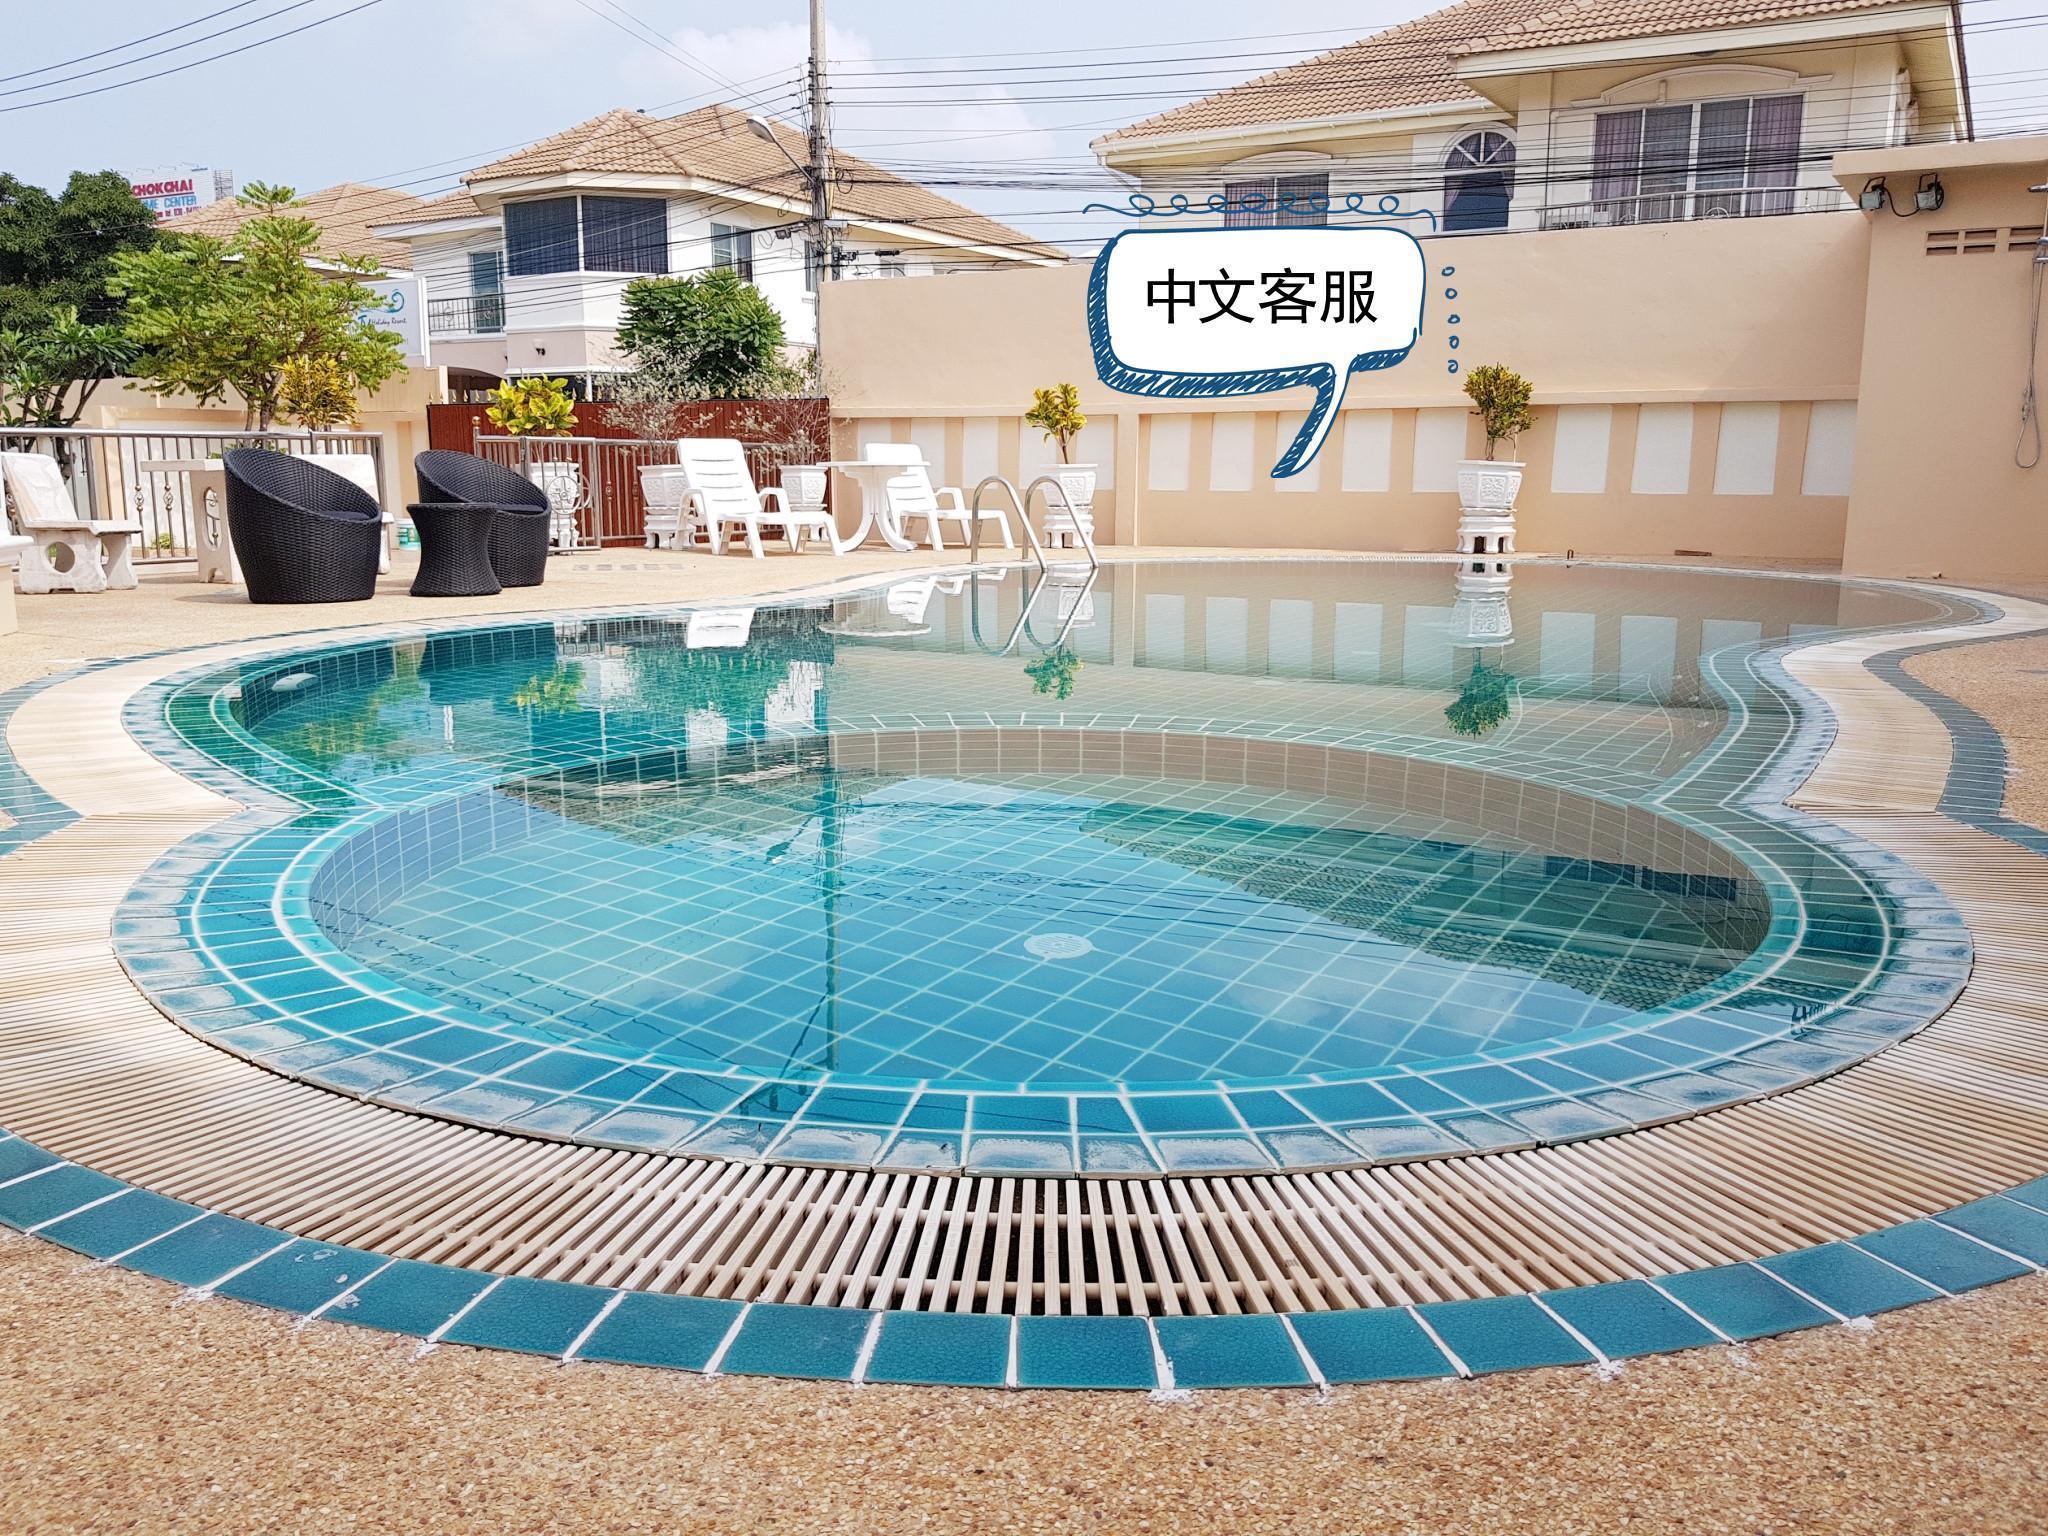 Central pattaya 7 bedroom pool villa  #217 วิลลา 7 ห้องนอน 8 ห้องน้ำส่วนตัว ขนาด 700 ตร.ม. – พัทยากลาง